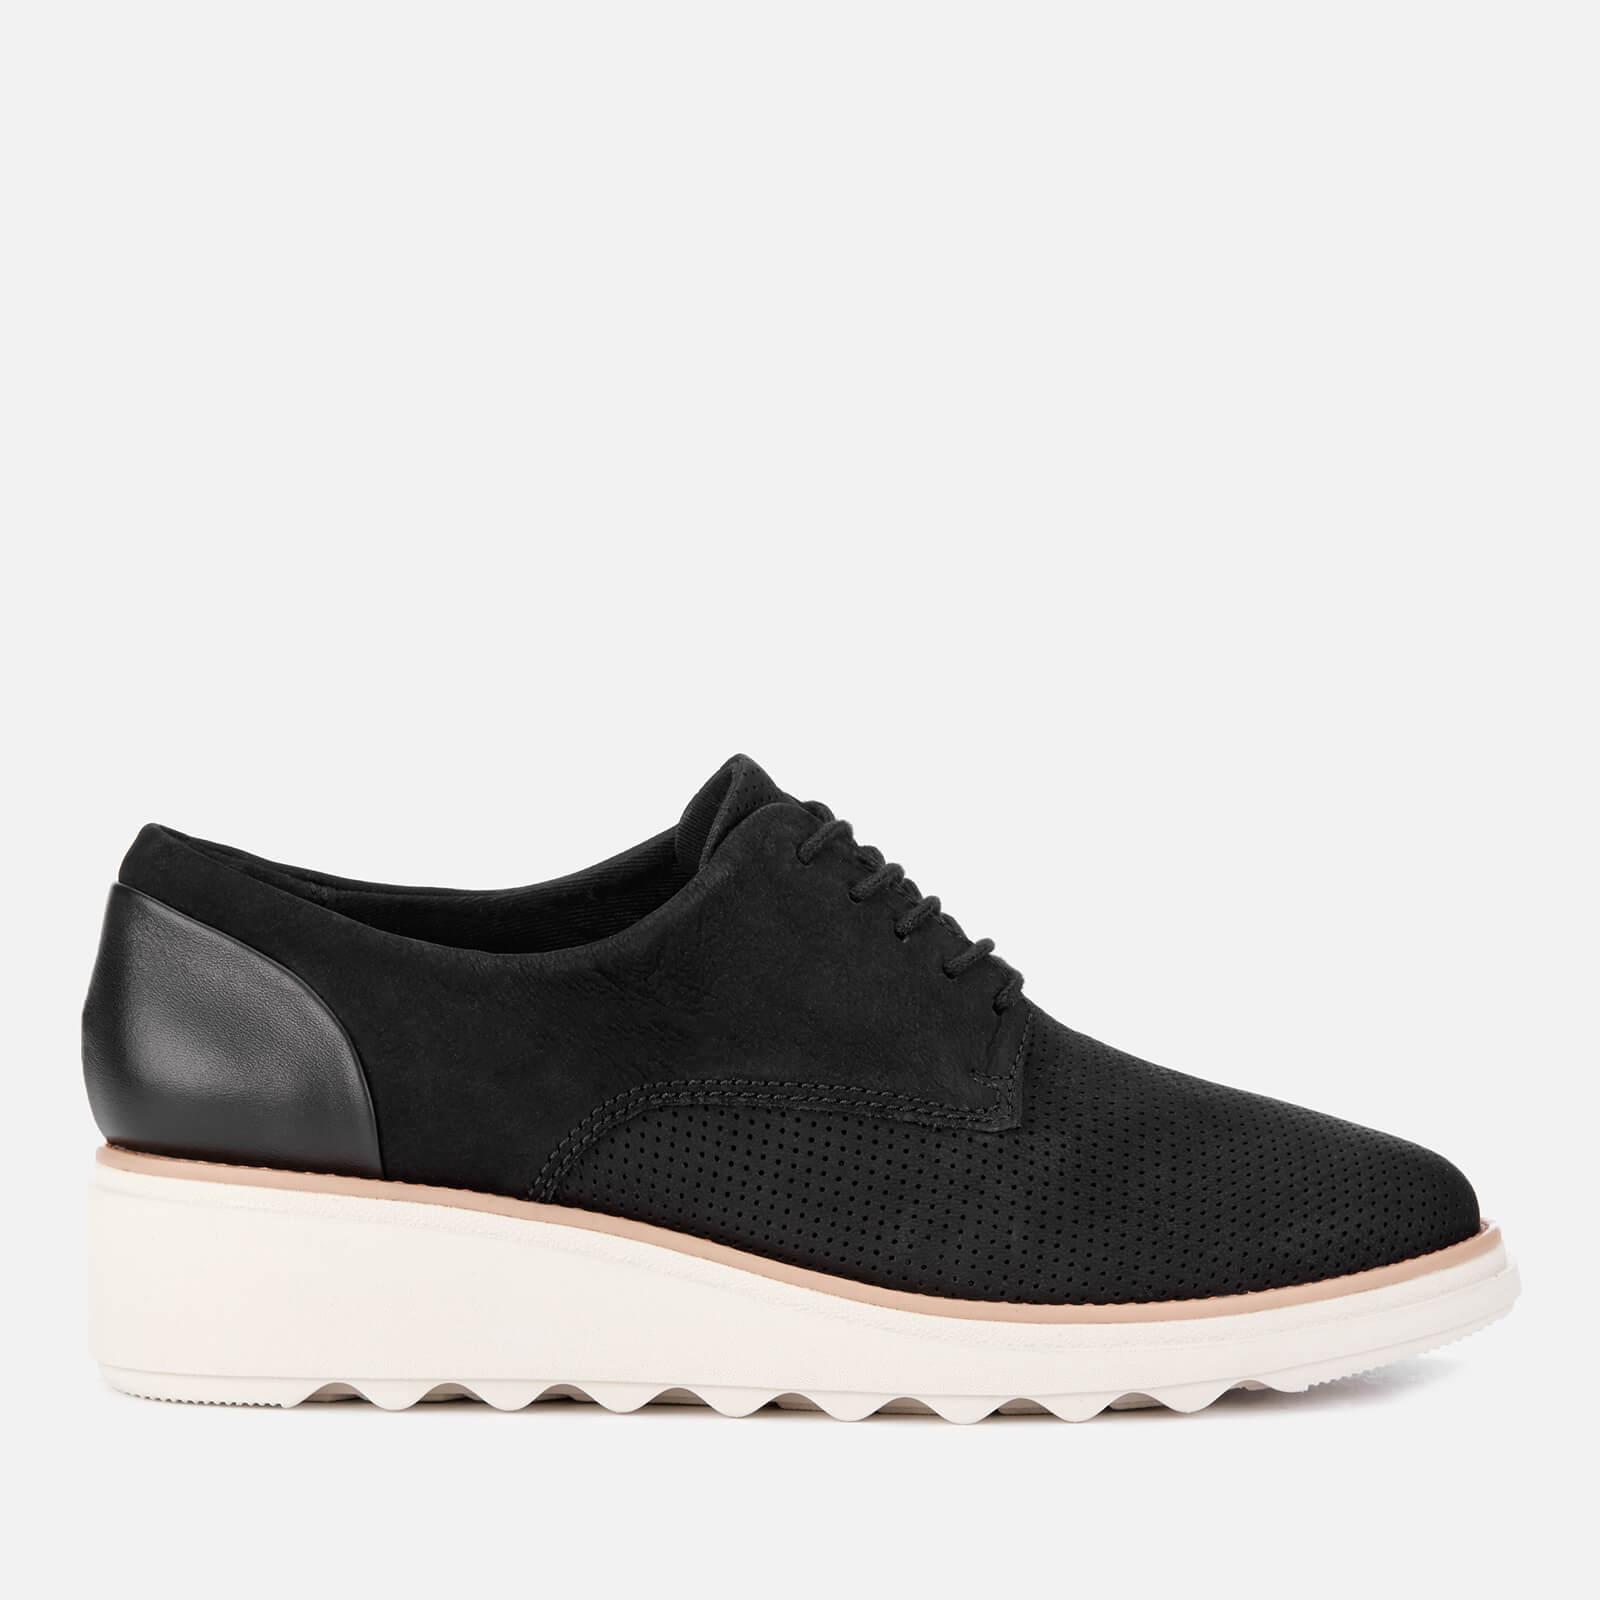 Clarks Women's Sharon Crystal Nubuck/Leather Lace Up Shoes - Black - UK 7 - Black